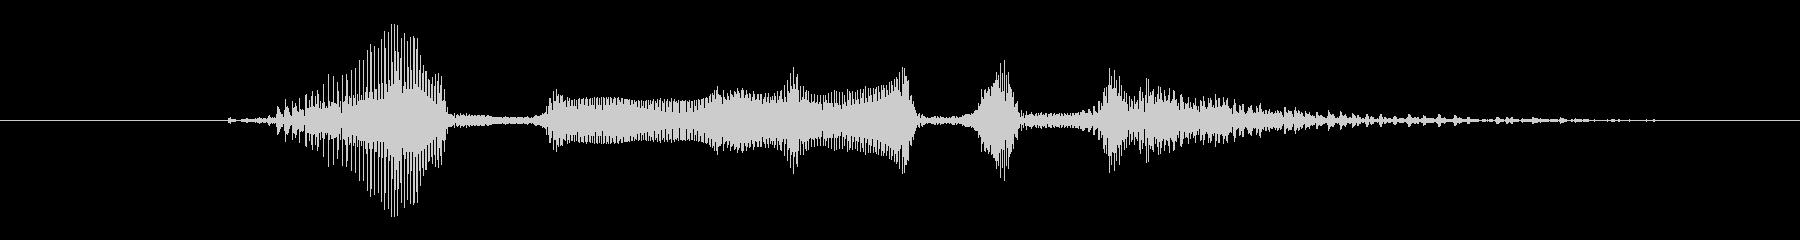 Unbelievable(テンション高)の未再生の波形